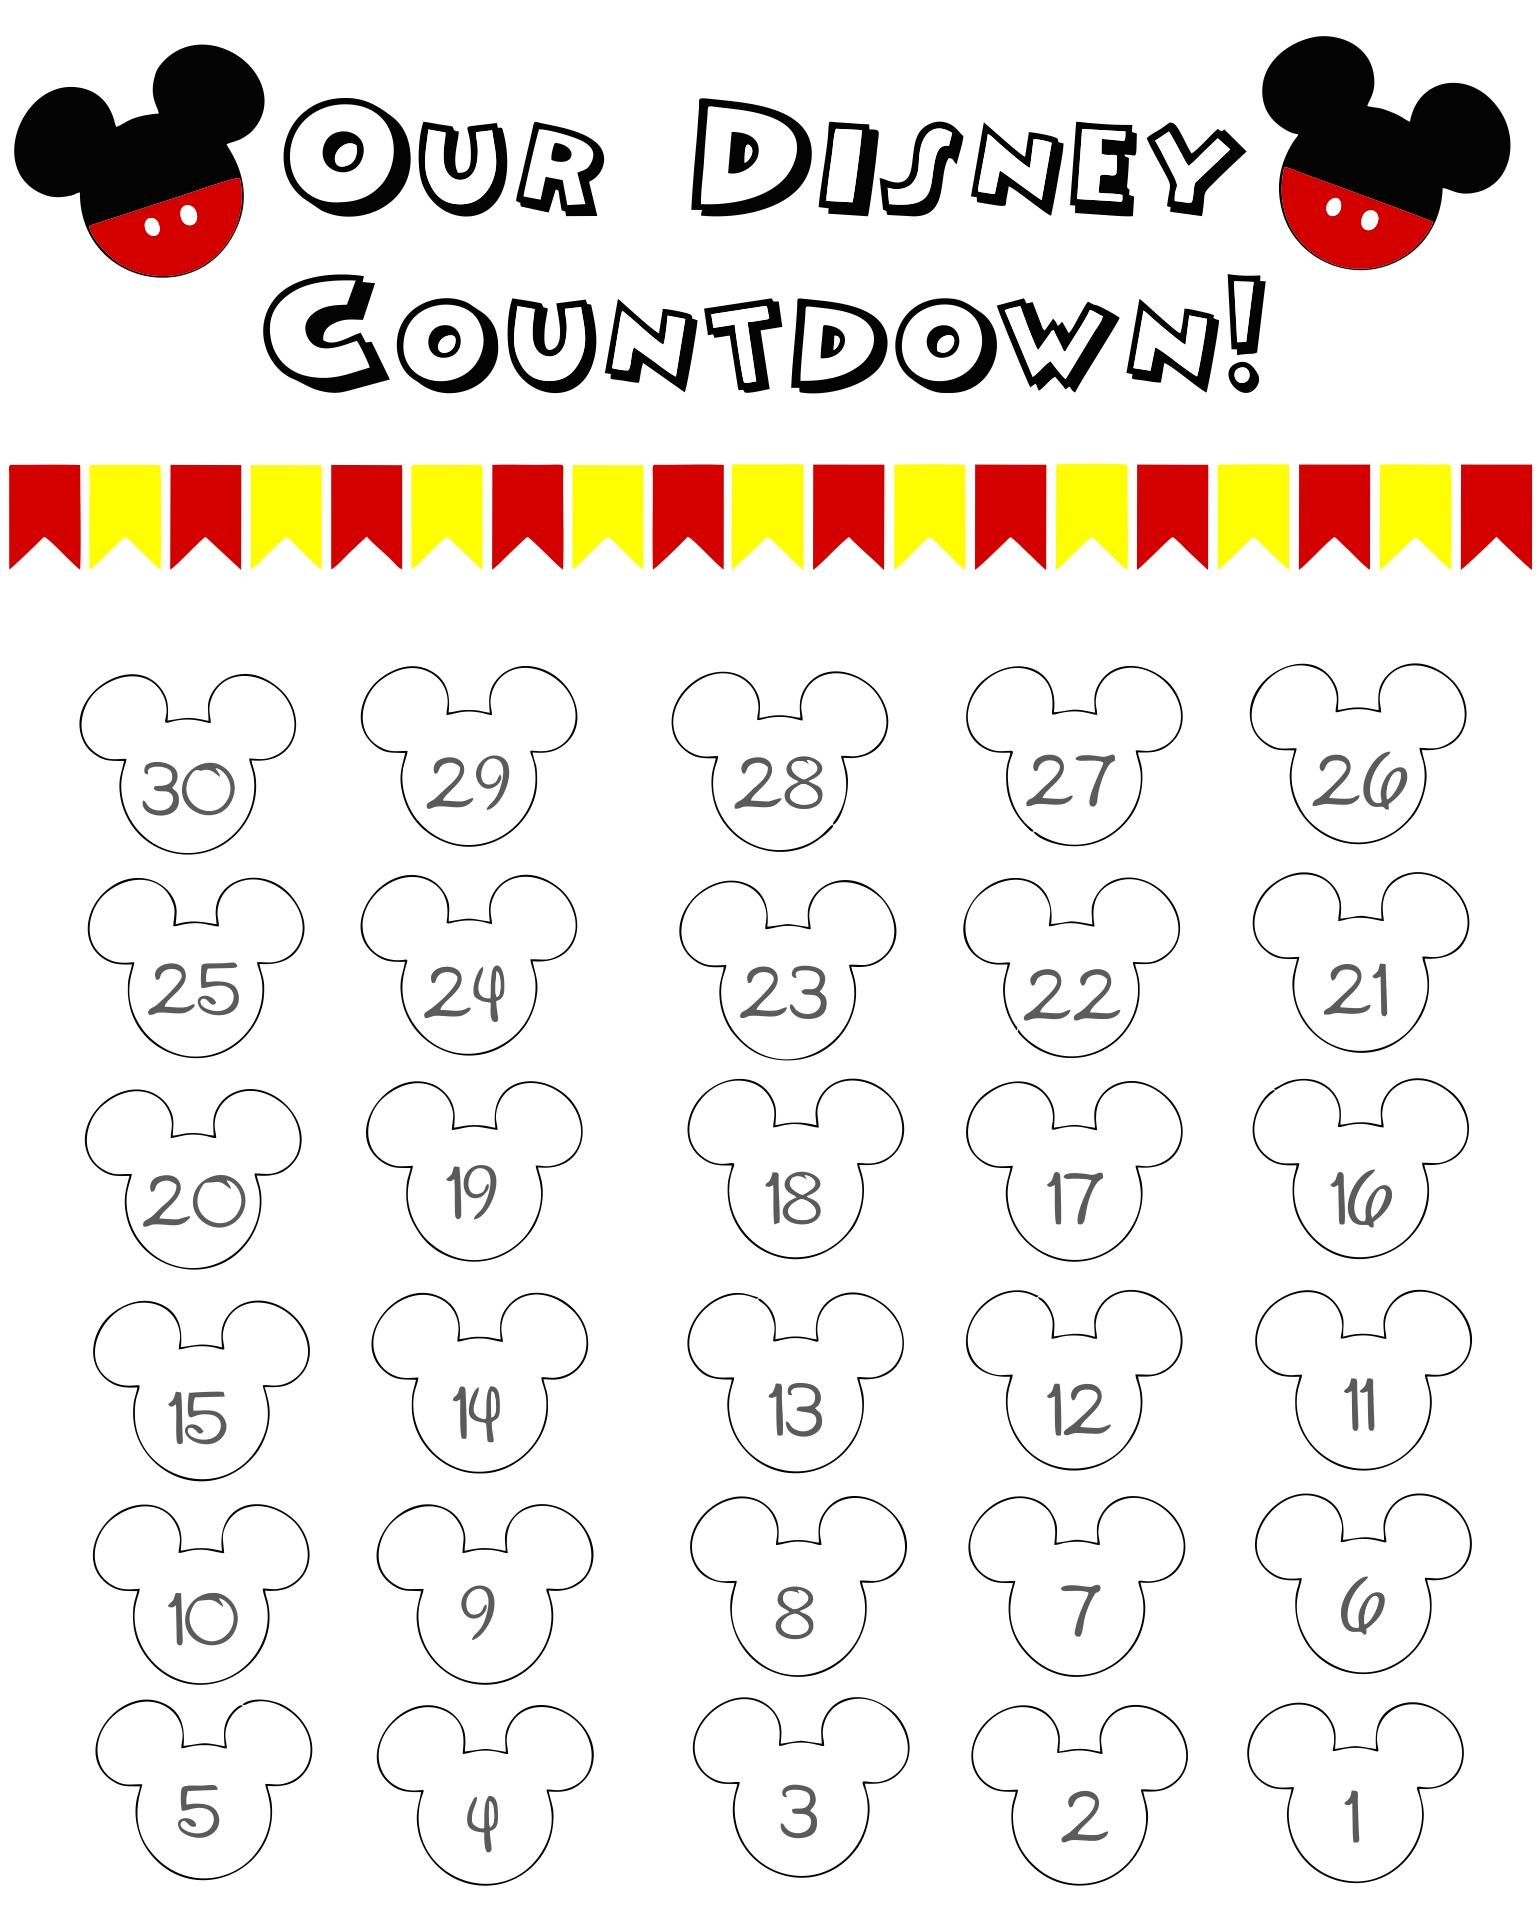 Disney Countdown Calendar Template